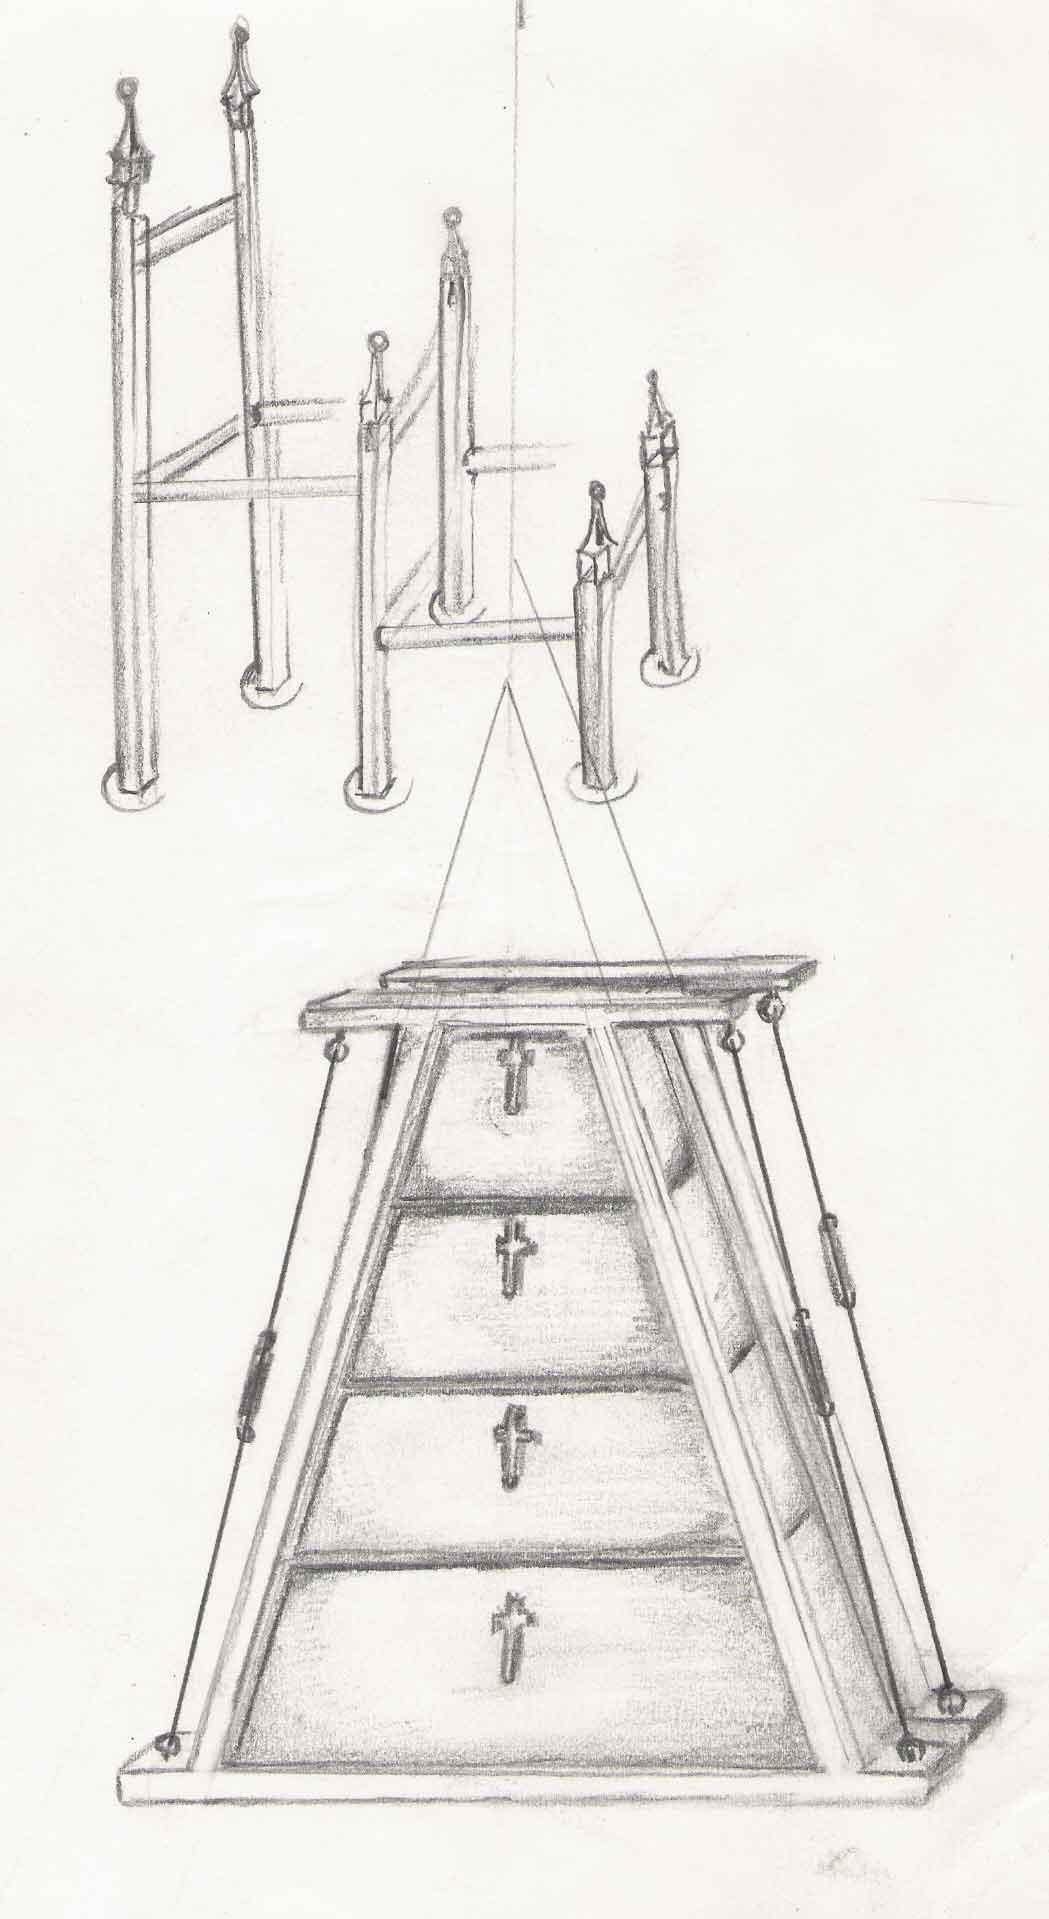 sketch-36-sept-05.jpg